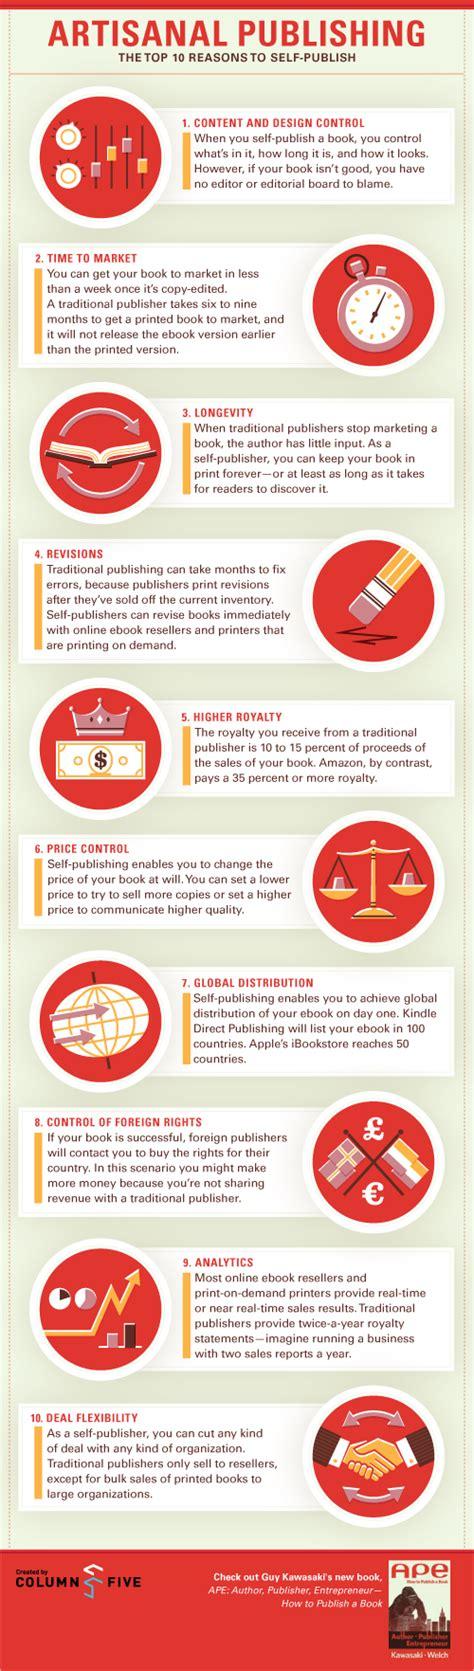 best self publishing site artisanal publishing the top 10 reasons to self publish